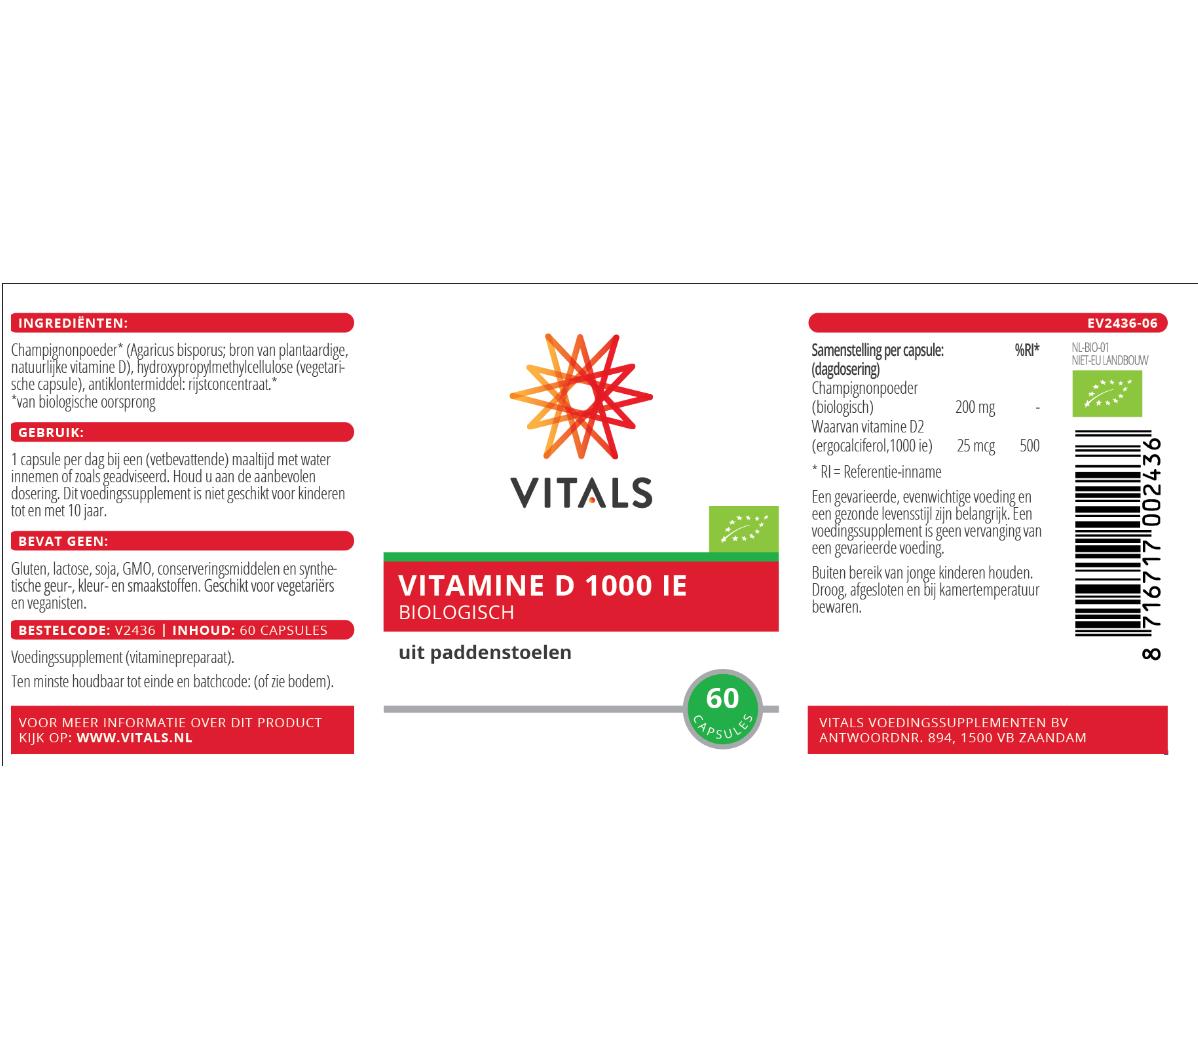 D Organic Vegan Vitamin D 1000iu 60 Tablets From Organic Mushrooms Vitals Pasio Online